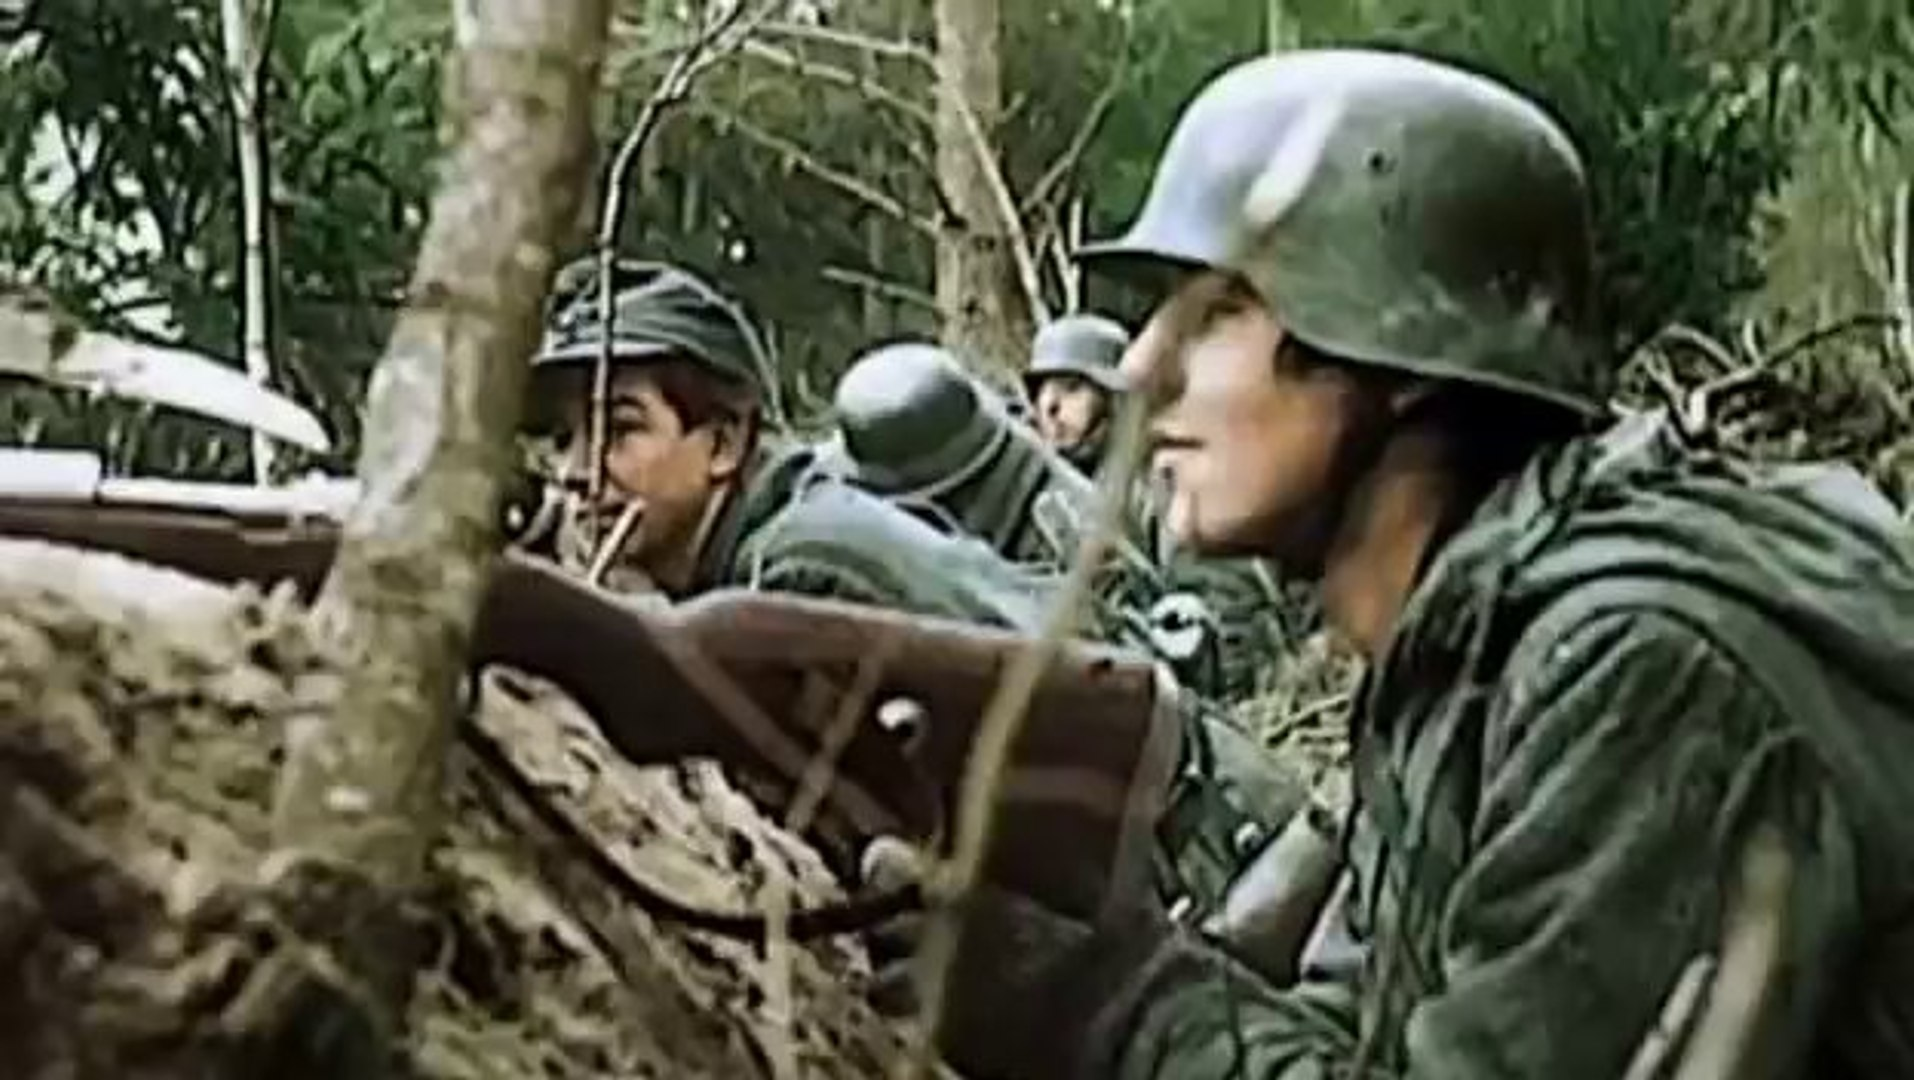 INVASION OF THE SOVIET UNION: WORLD WAR II - Military History (documentary)